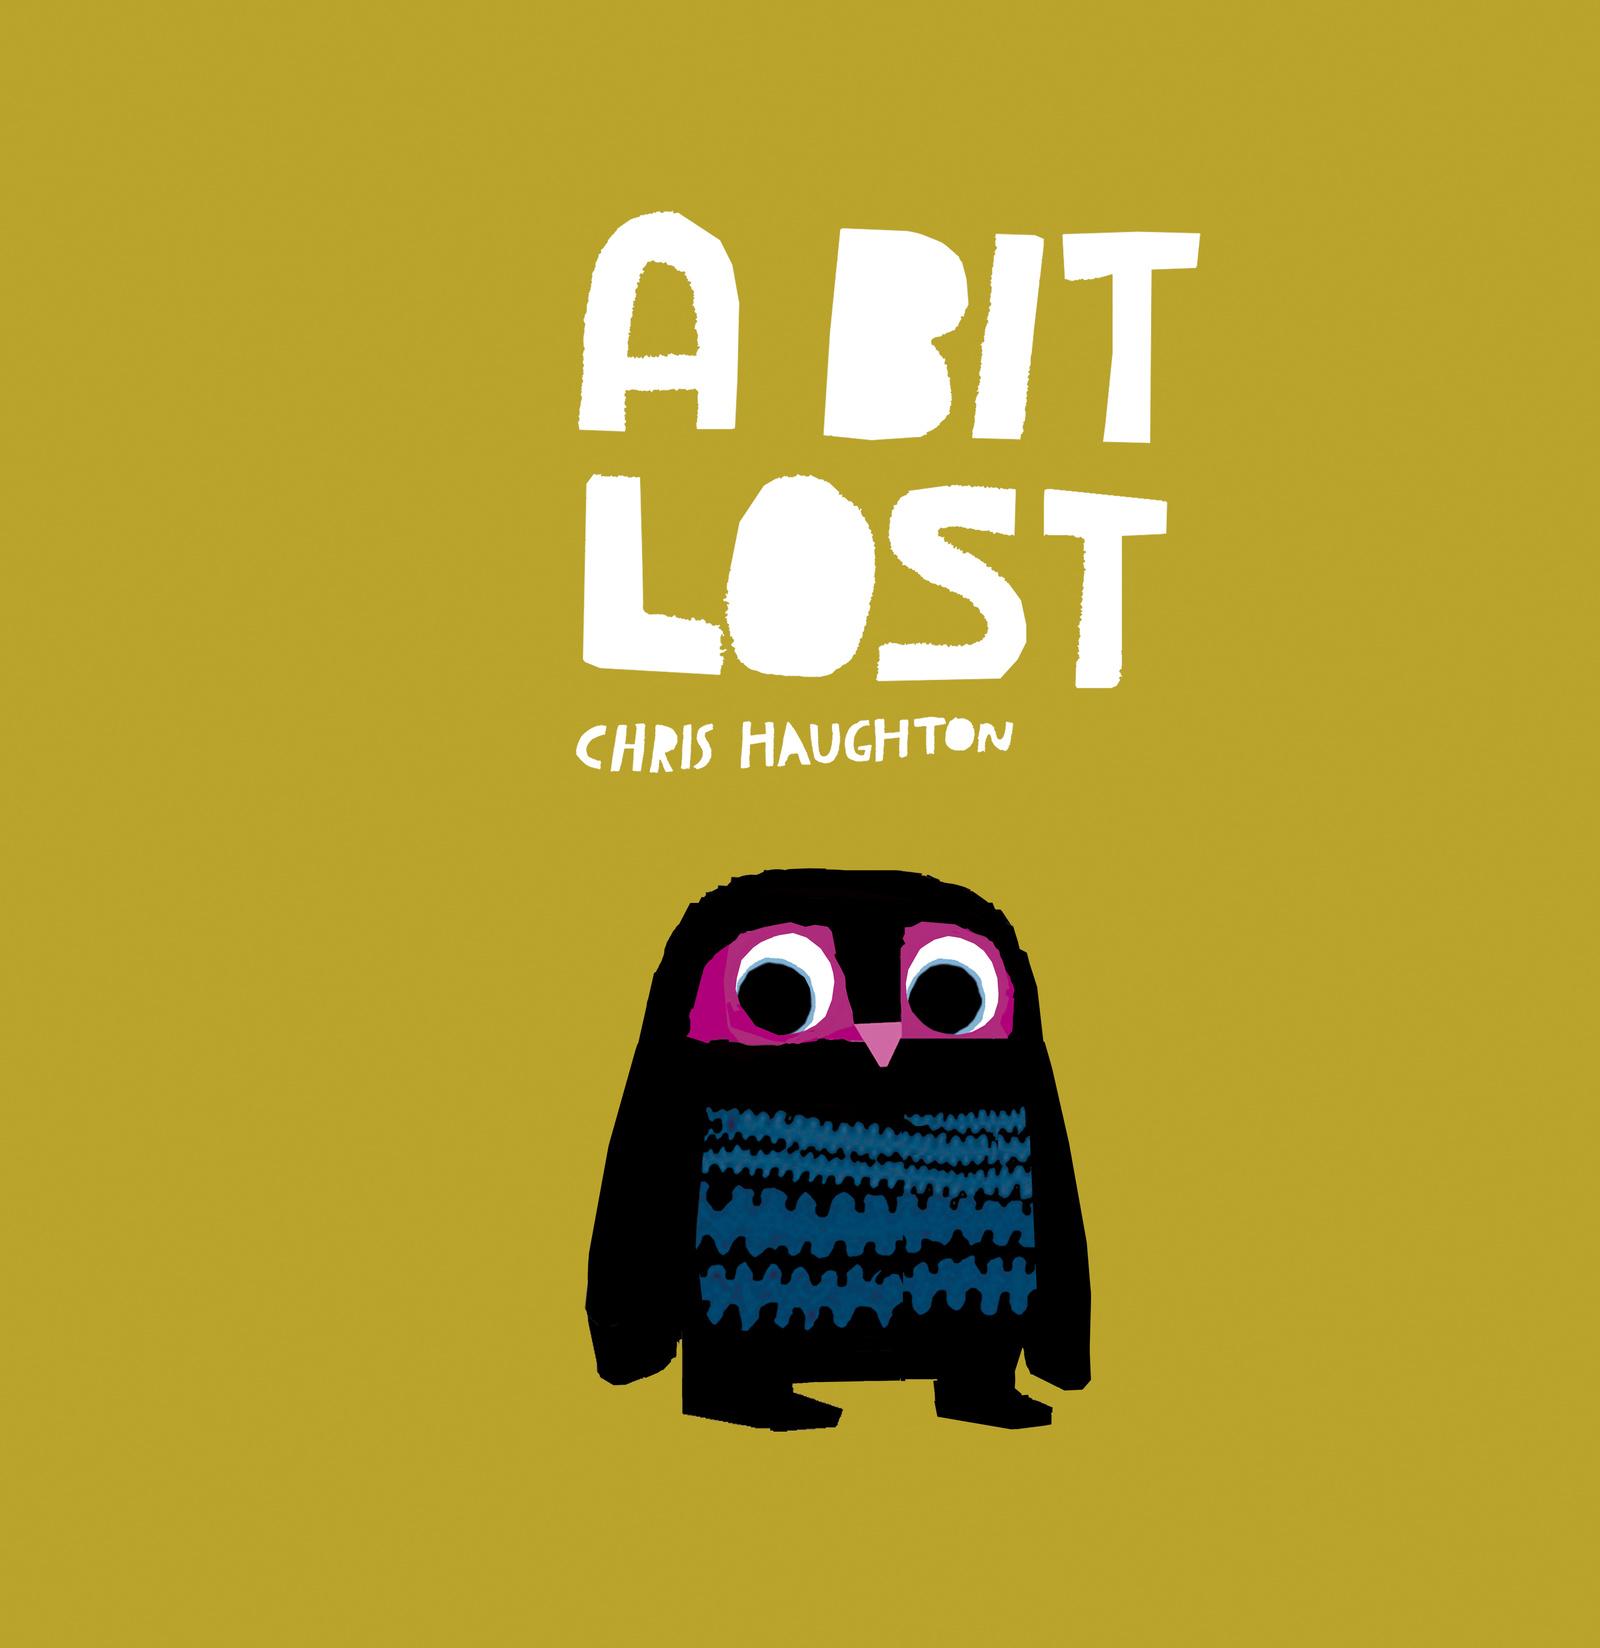 A bit lost. Chris Haughton. Walker books. 2013